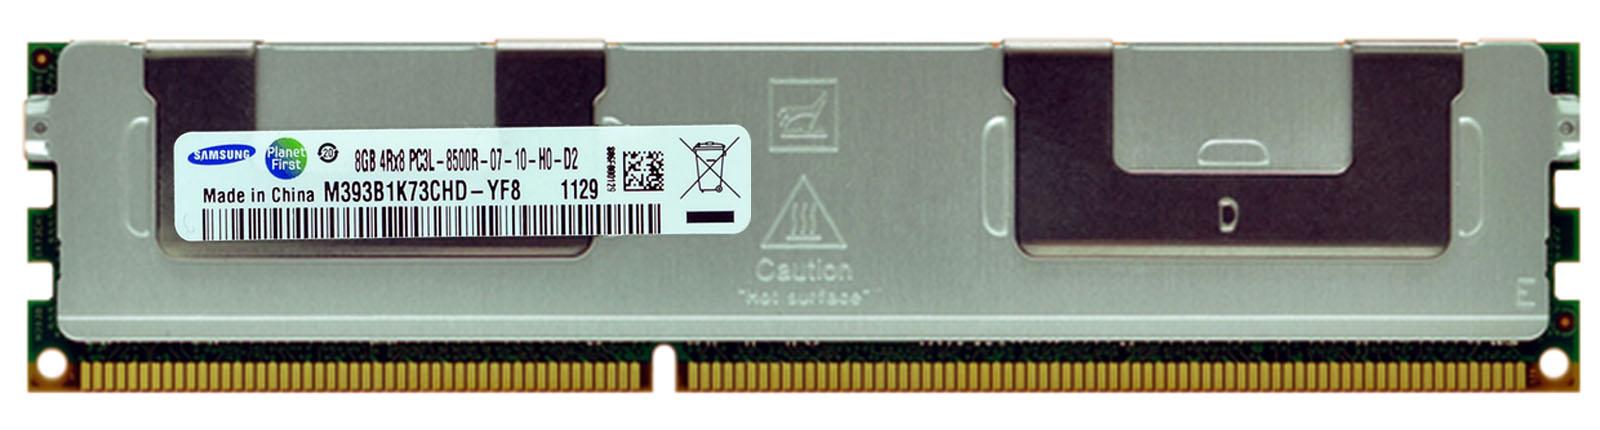 M4L Certified 8GB 1066MHz DDR3 PC3-8500 Reg ECC CL7 240-Pin Quad Rank x8 1.35V Low Voltage DIMM Mfr P/N M4L-PC31066RD3Q87DL-8G